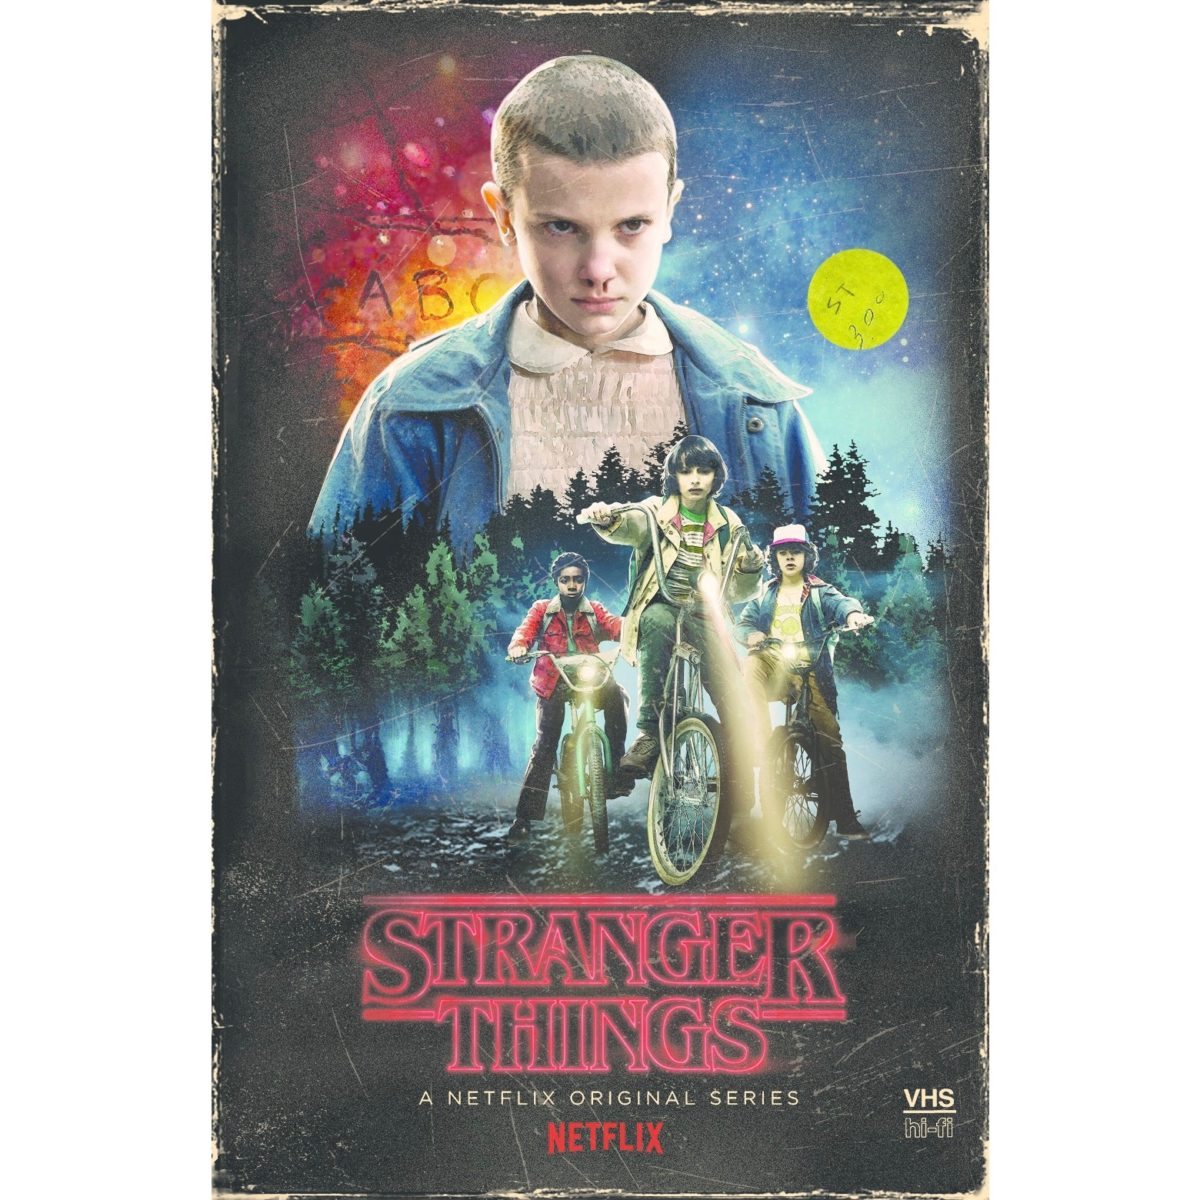 stranger things season 1 DVD bluray